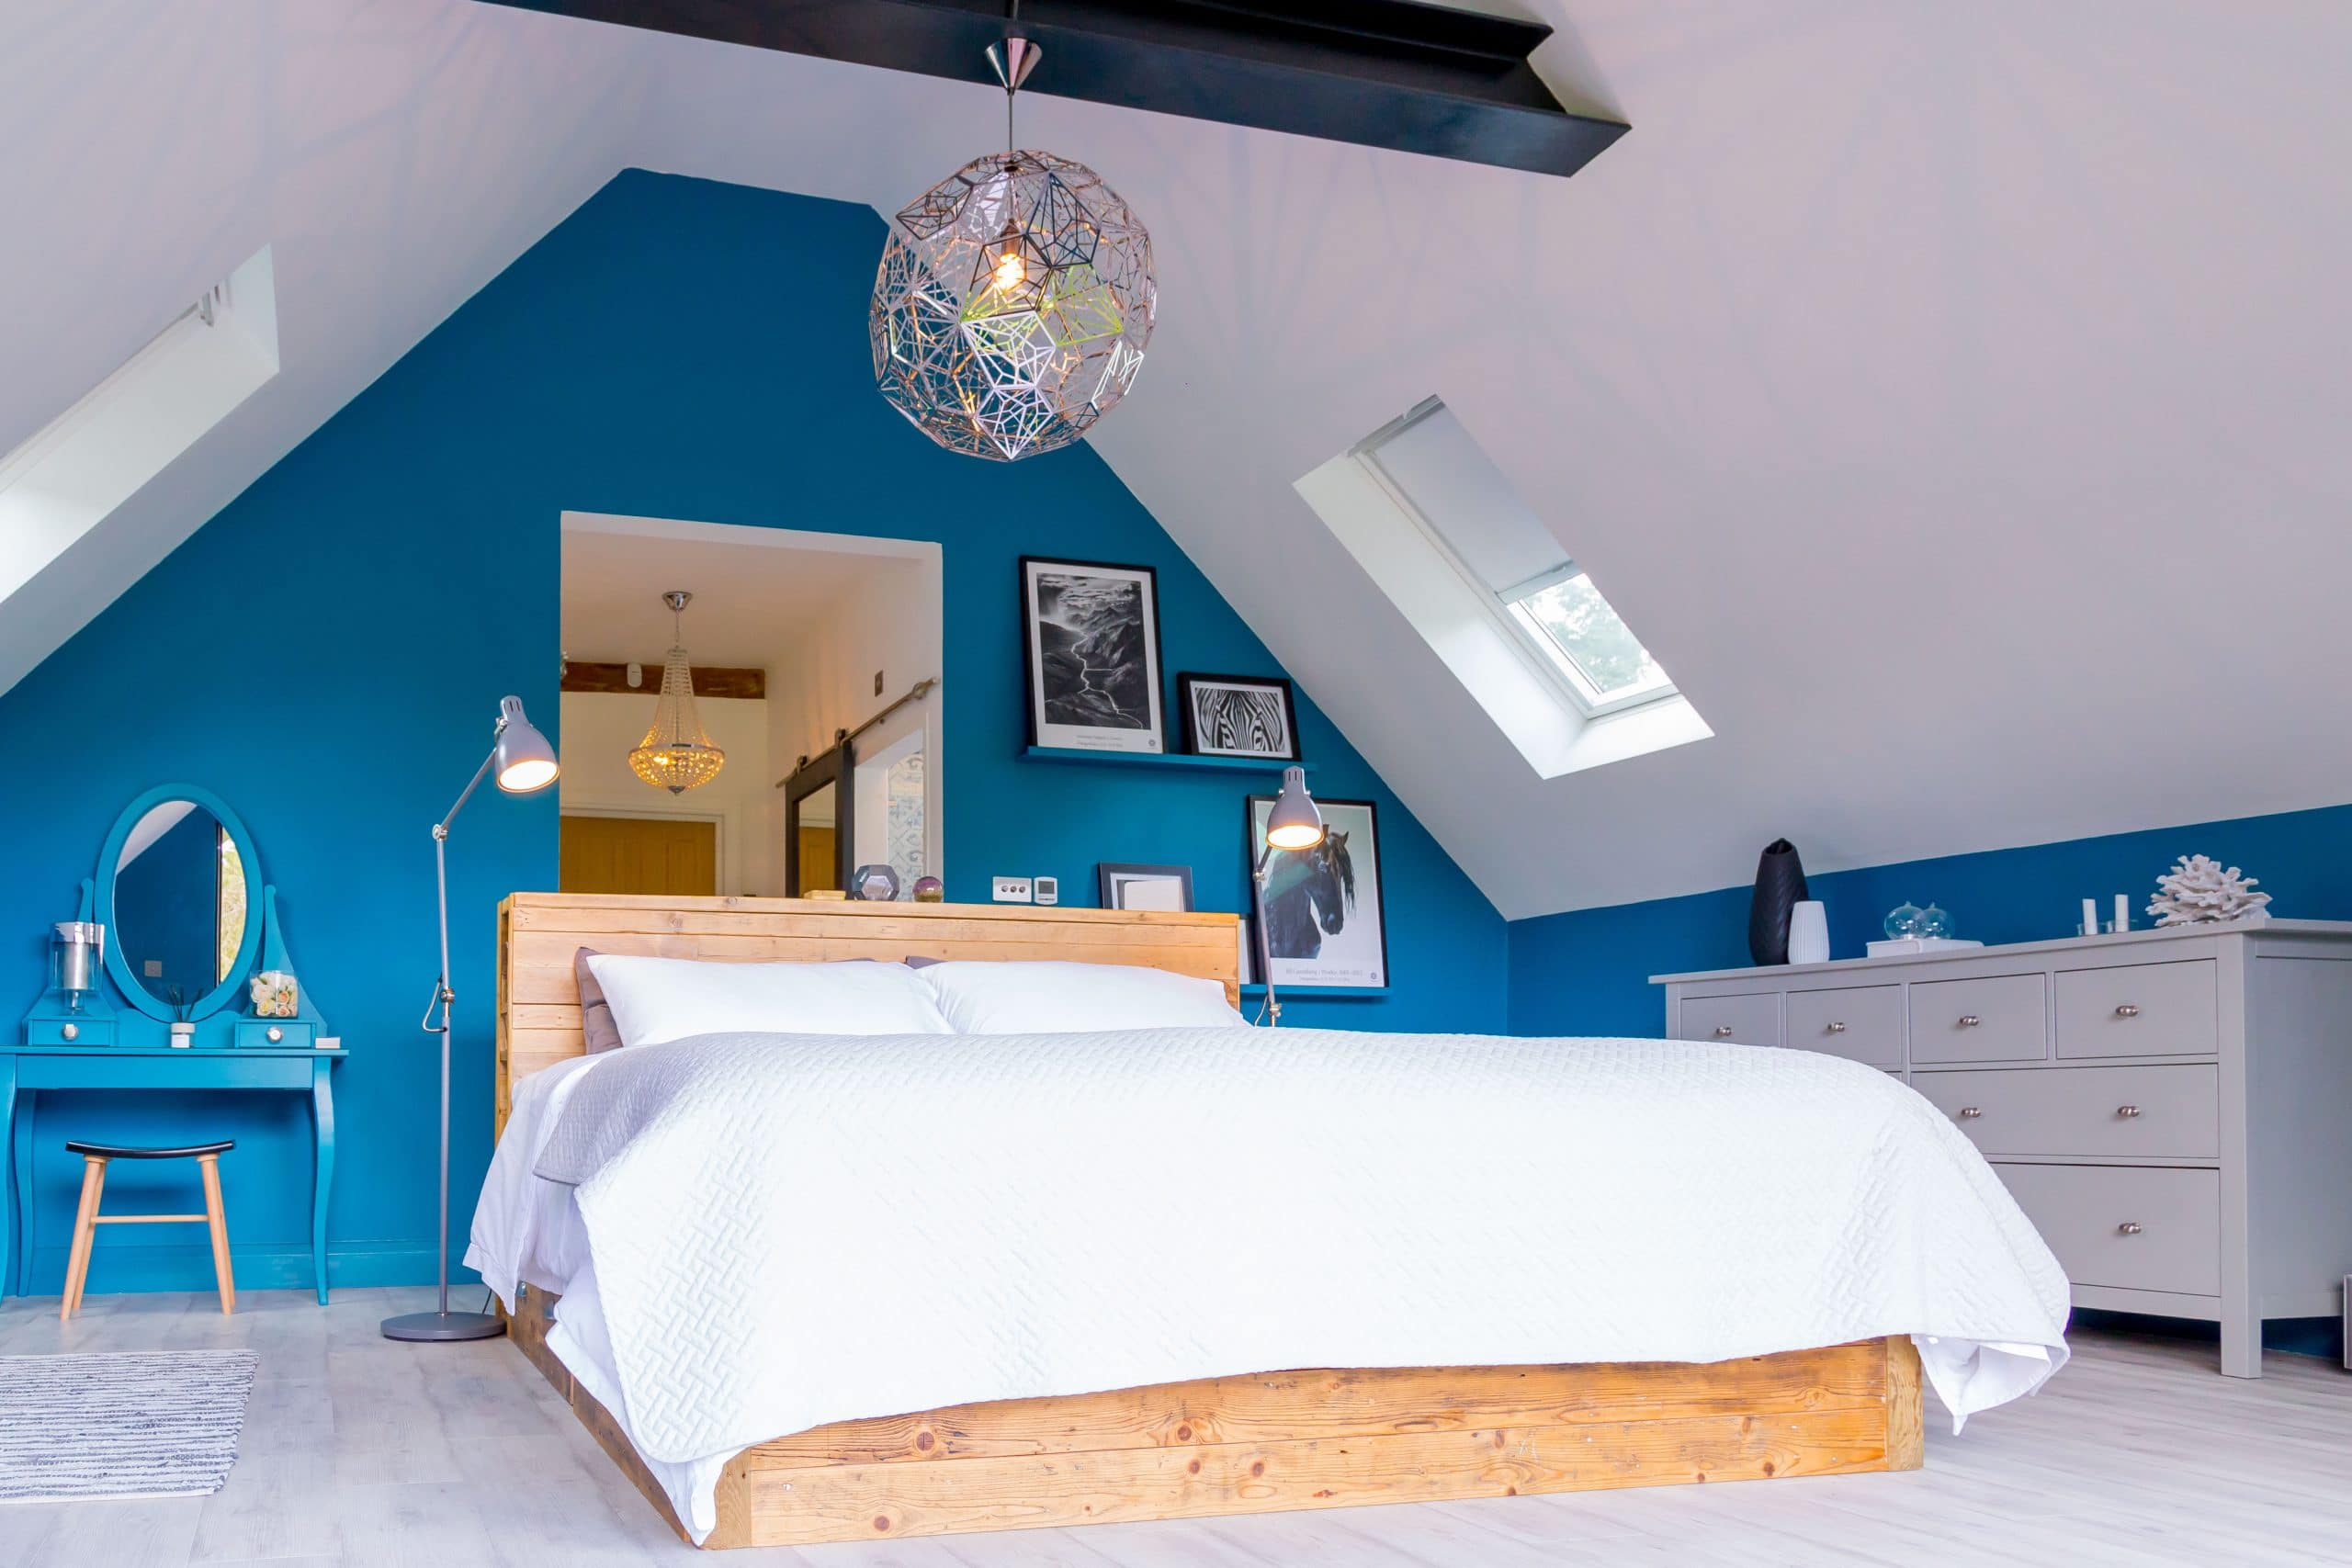 Stoke Poges bedroom